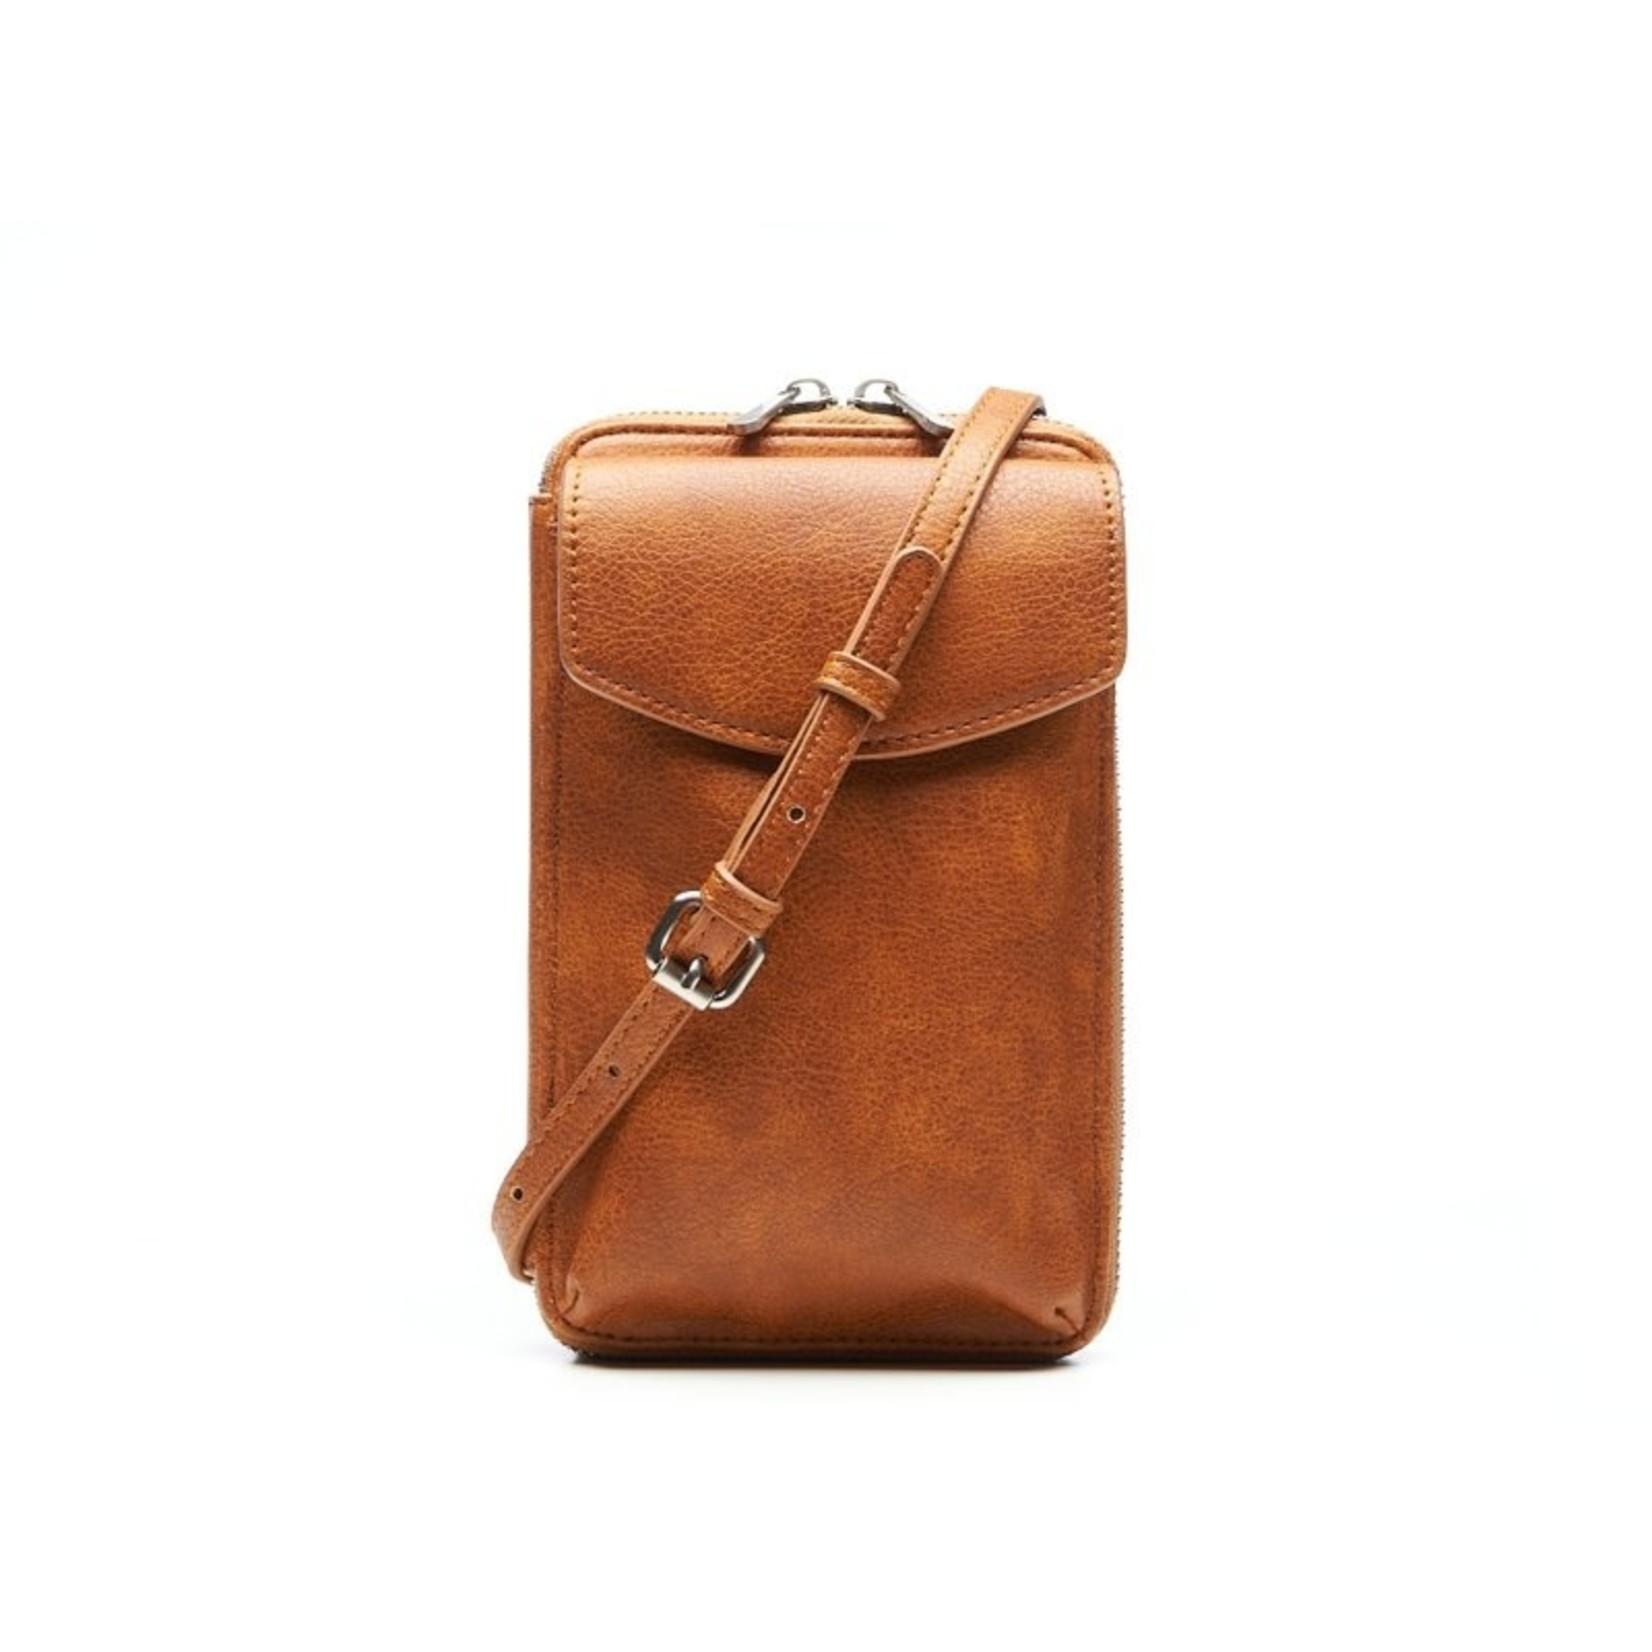 Brasca Brasca Phone Bag Camel